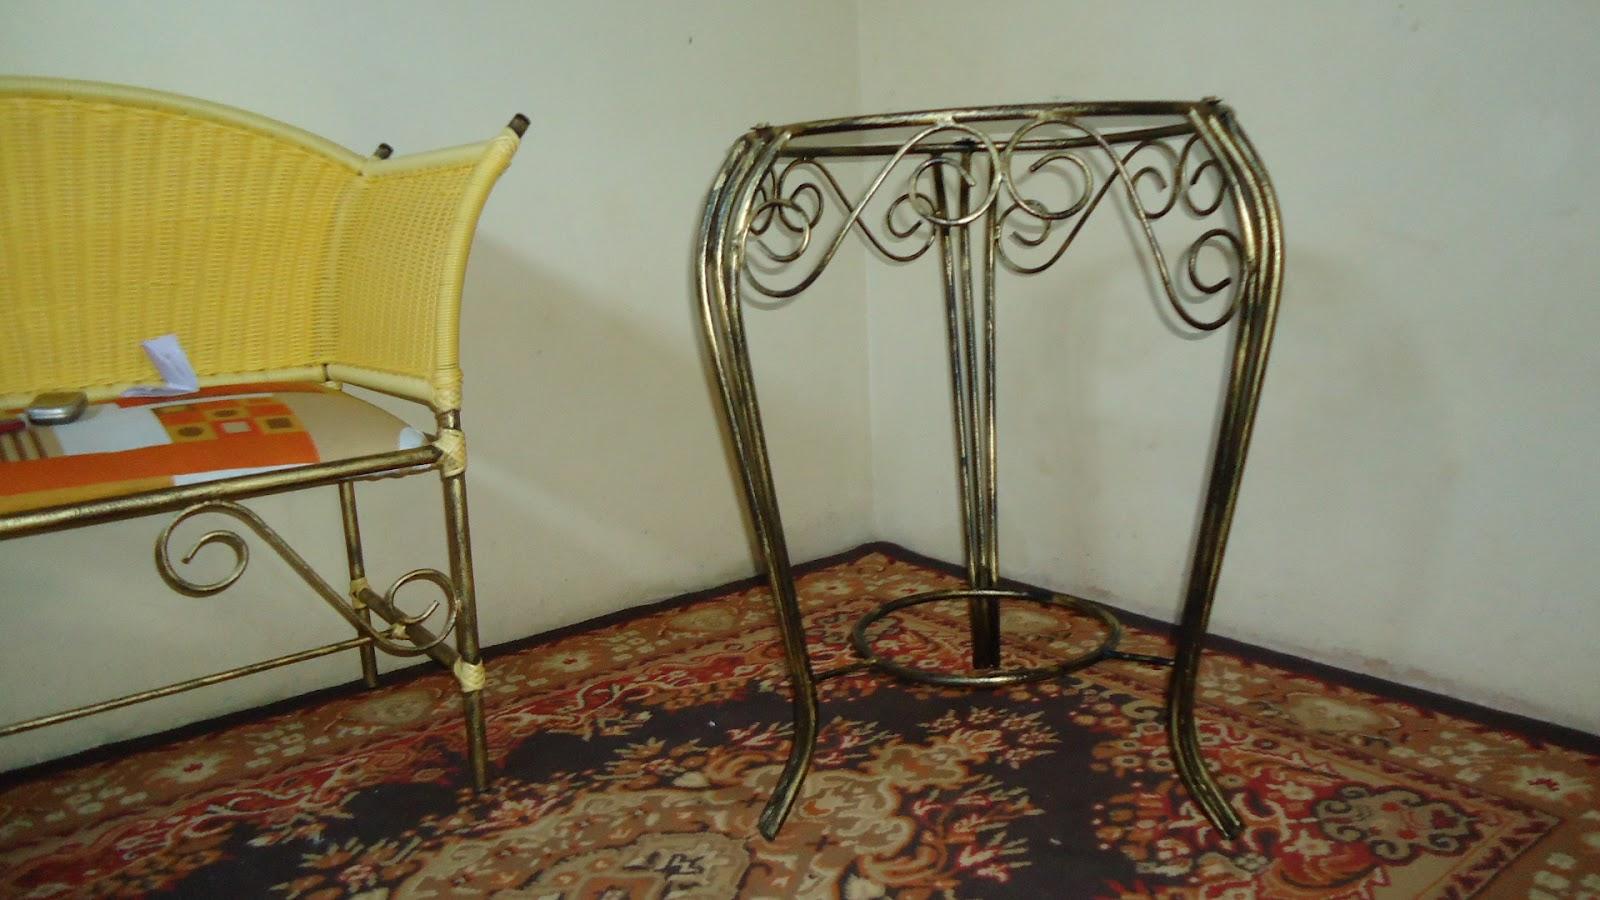 mesa de canto feita de ferro e pintada com ouro #988833 1600x900